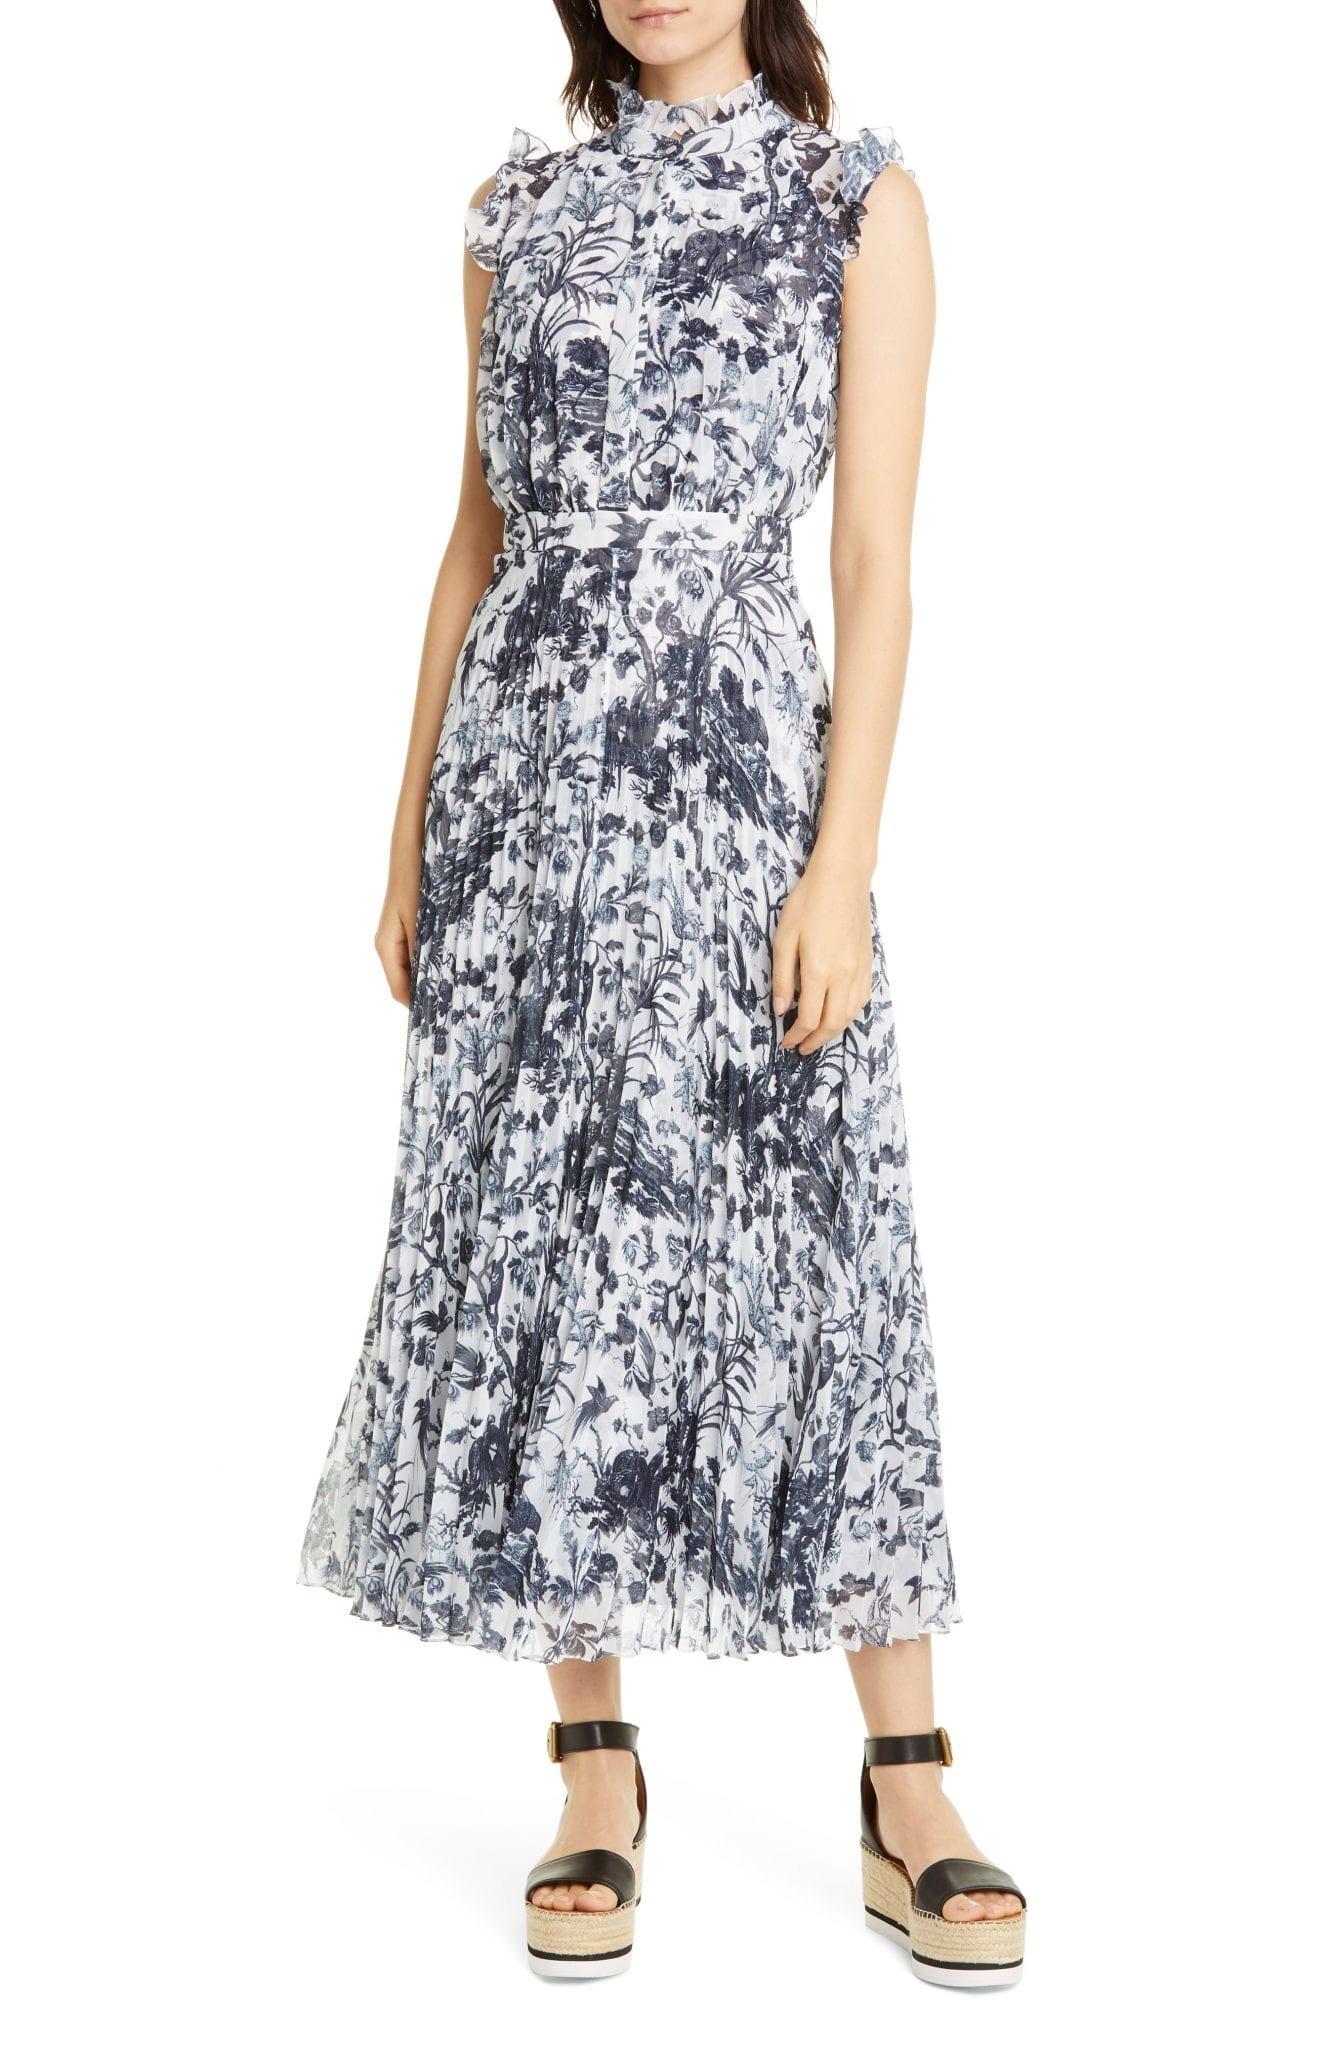 ERDEM Floral Ruffle Pleated Midi Dress